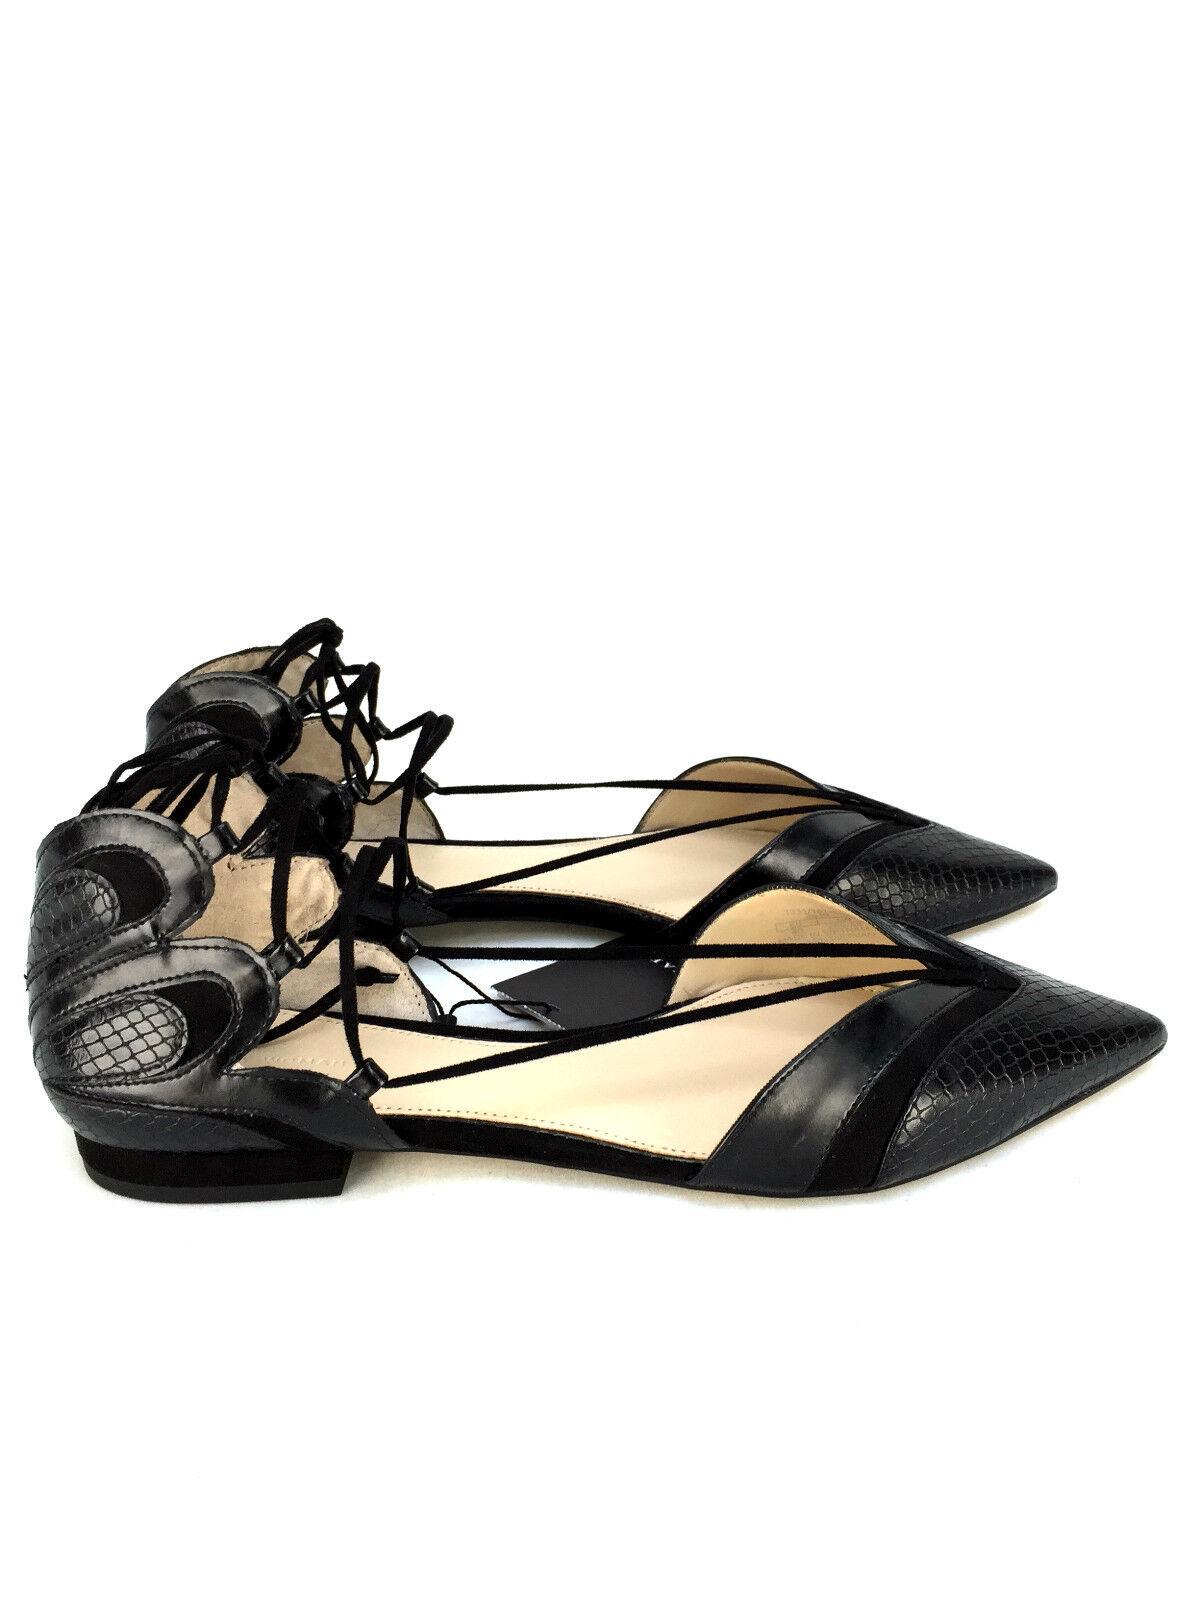 ZARA BLACK BALLERINAS FLAT VAMP Schuhe WITH STRAPS SIZE UK 5 7